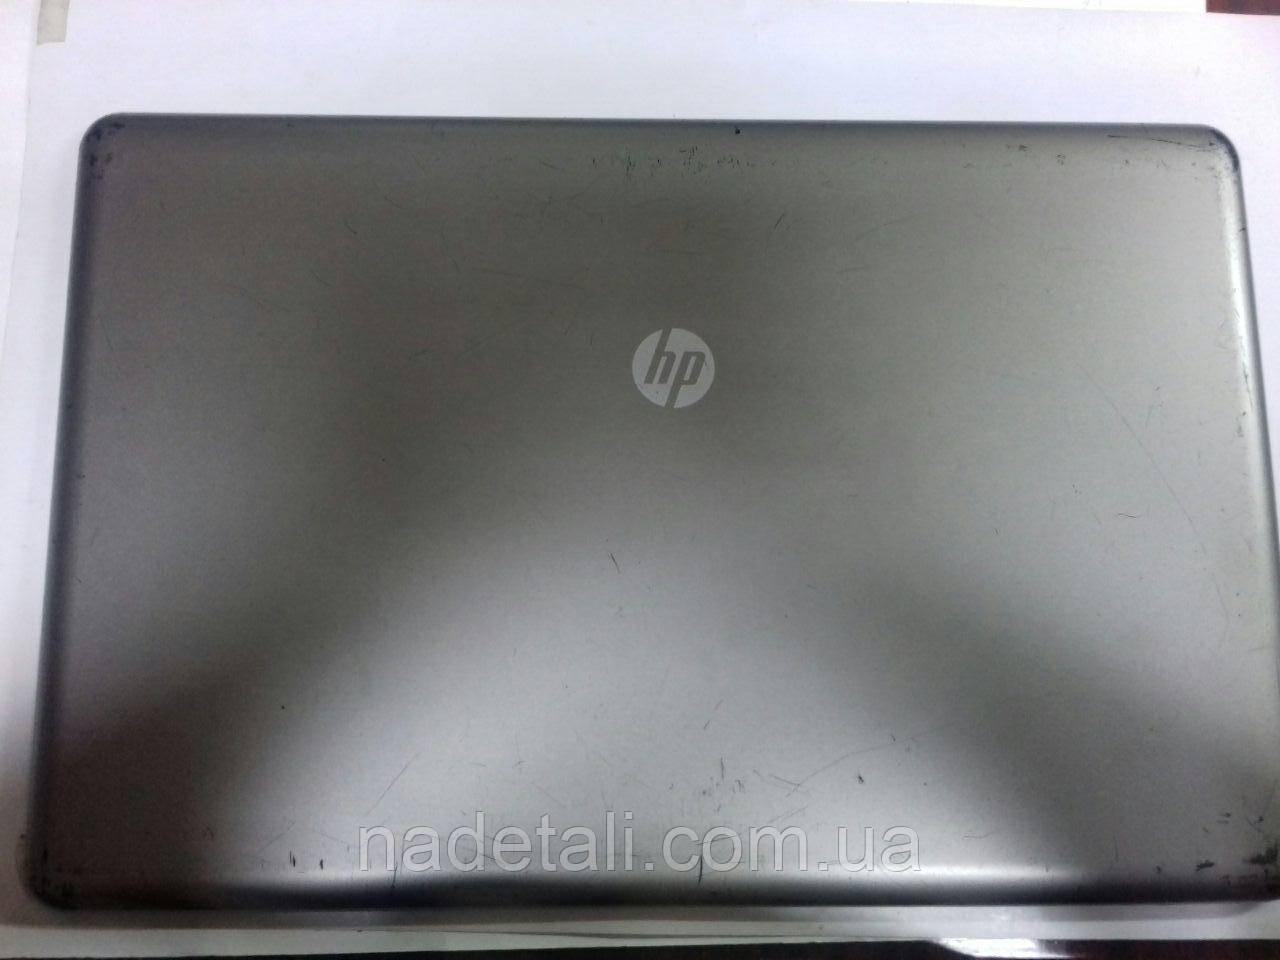 Крышка матрицы HP Compaq CQ57 630 635 646837-001